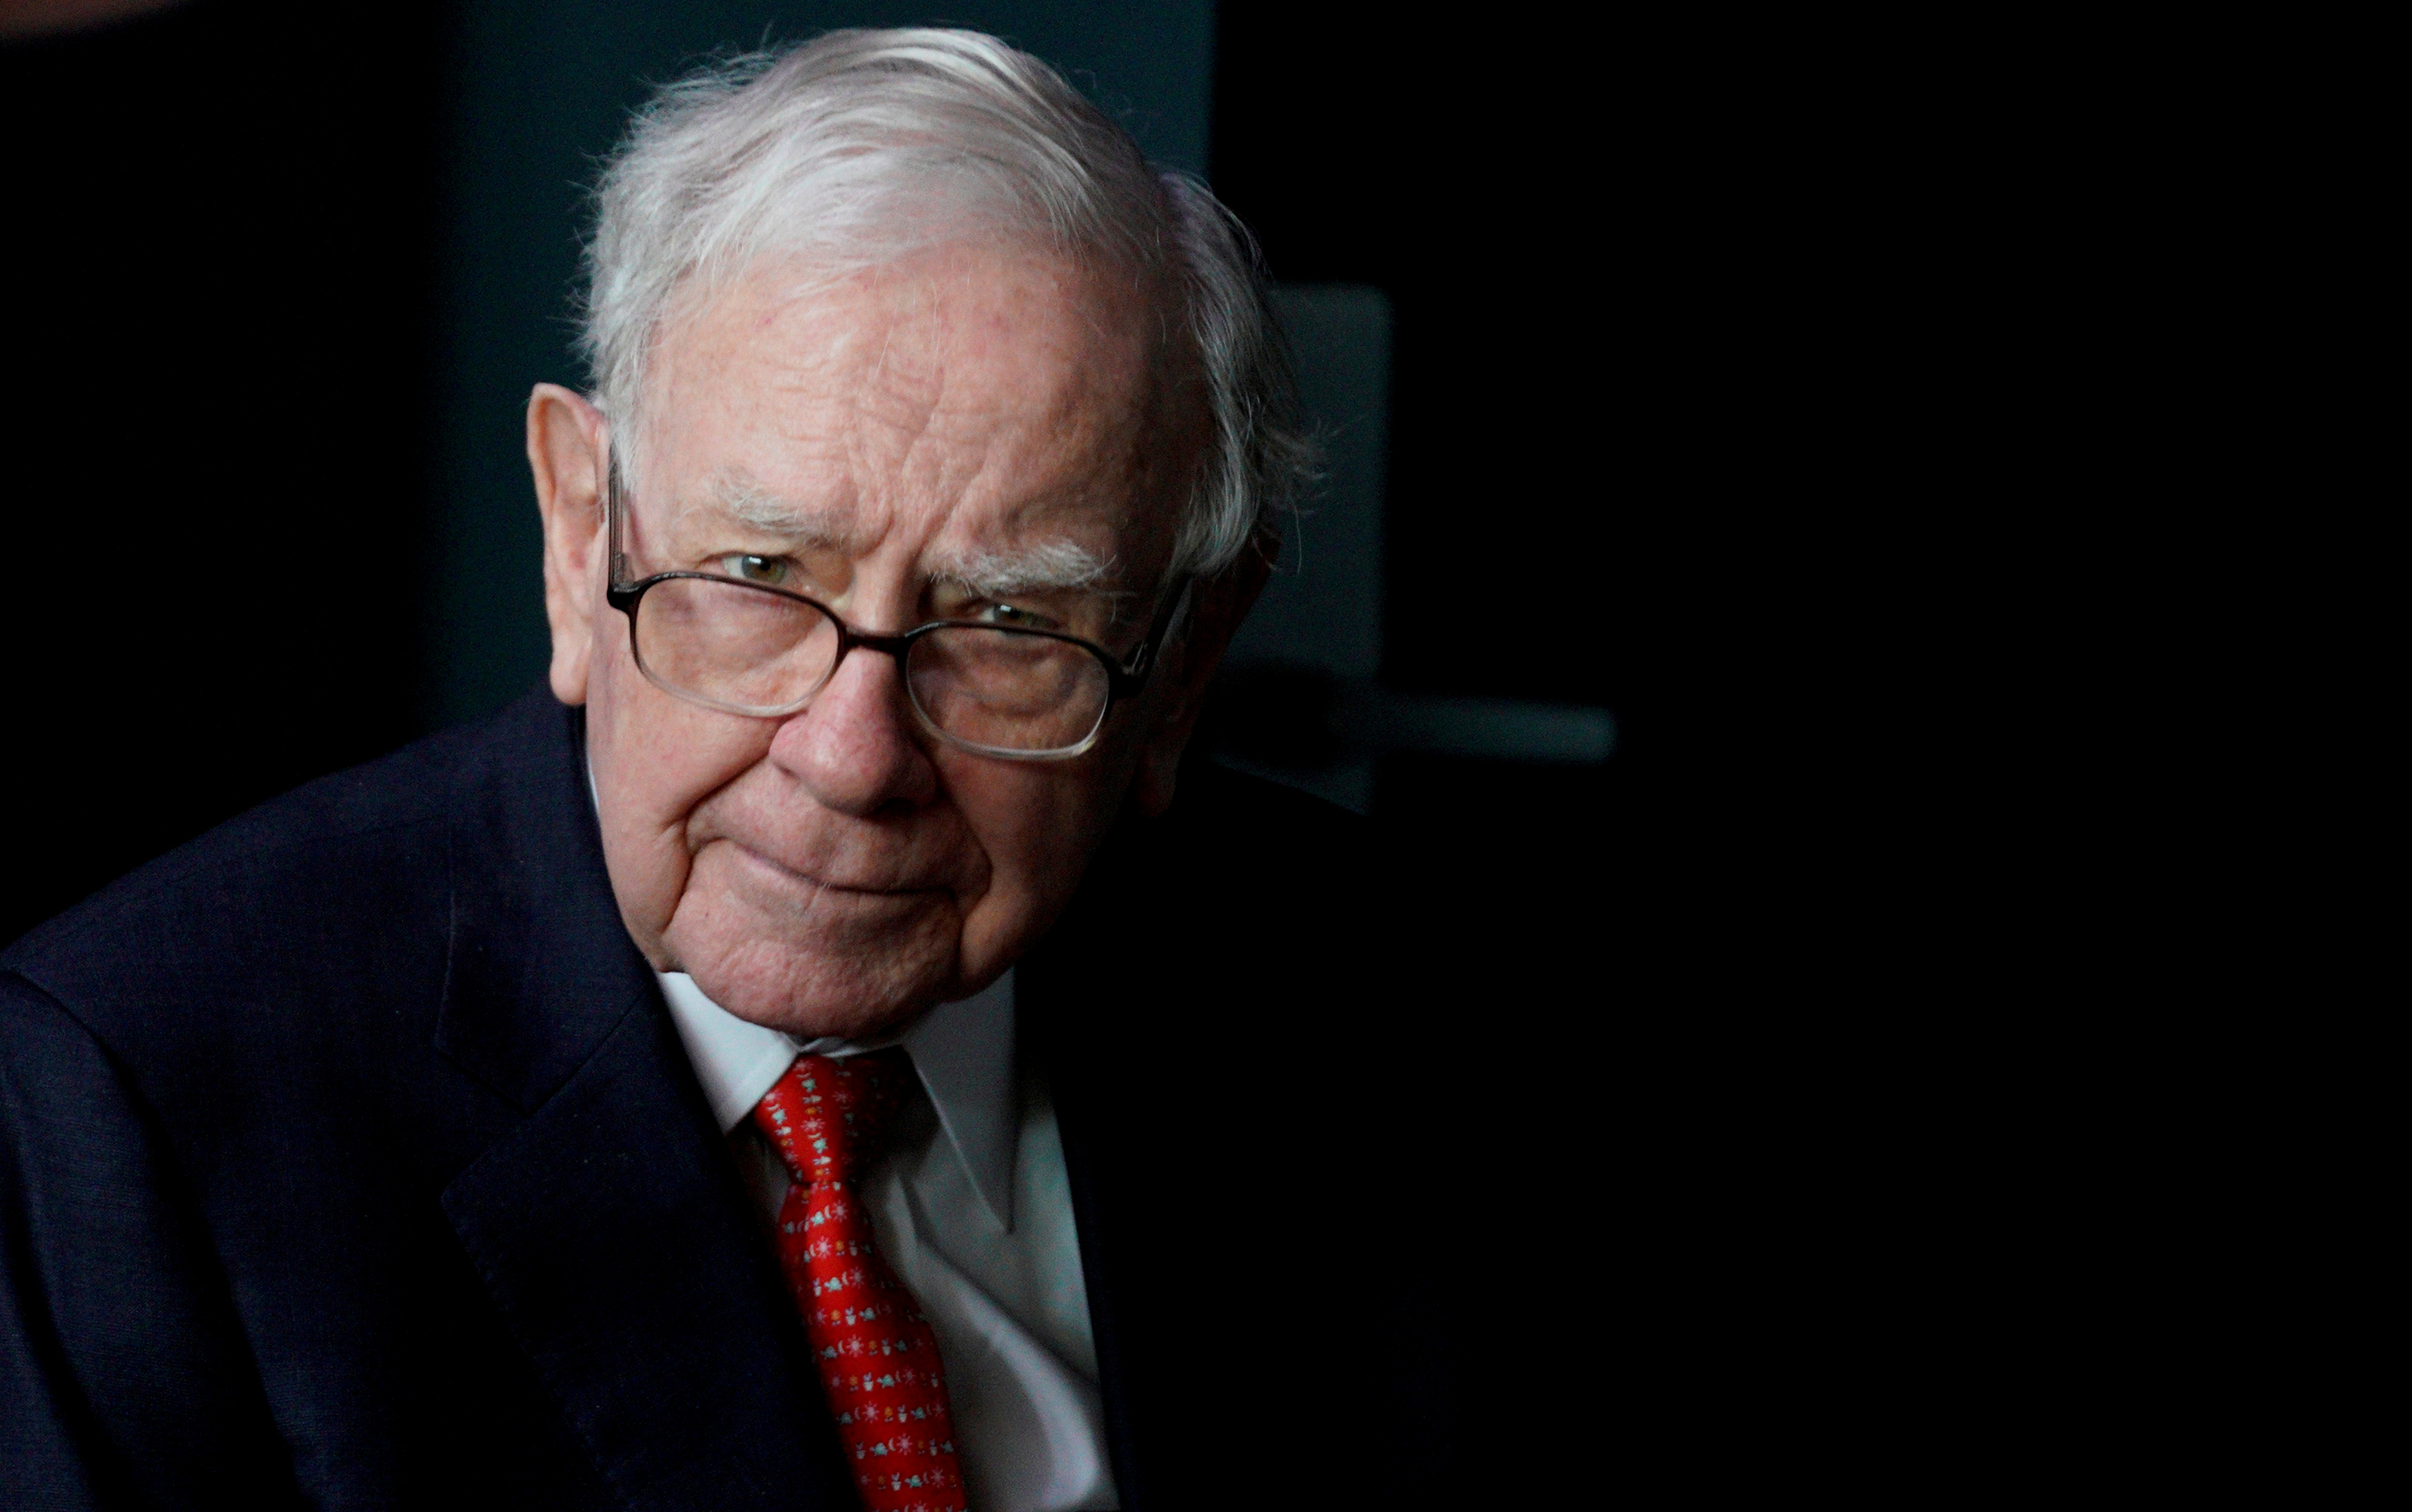 Warren Buffett, CEO of Berkshire Hathaway Inc, pauses while playing bridge as part of the company annual meeting weekend in Omaha, Nebraska U.S. May 6, 2018.